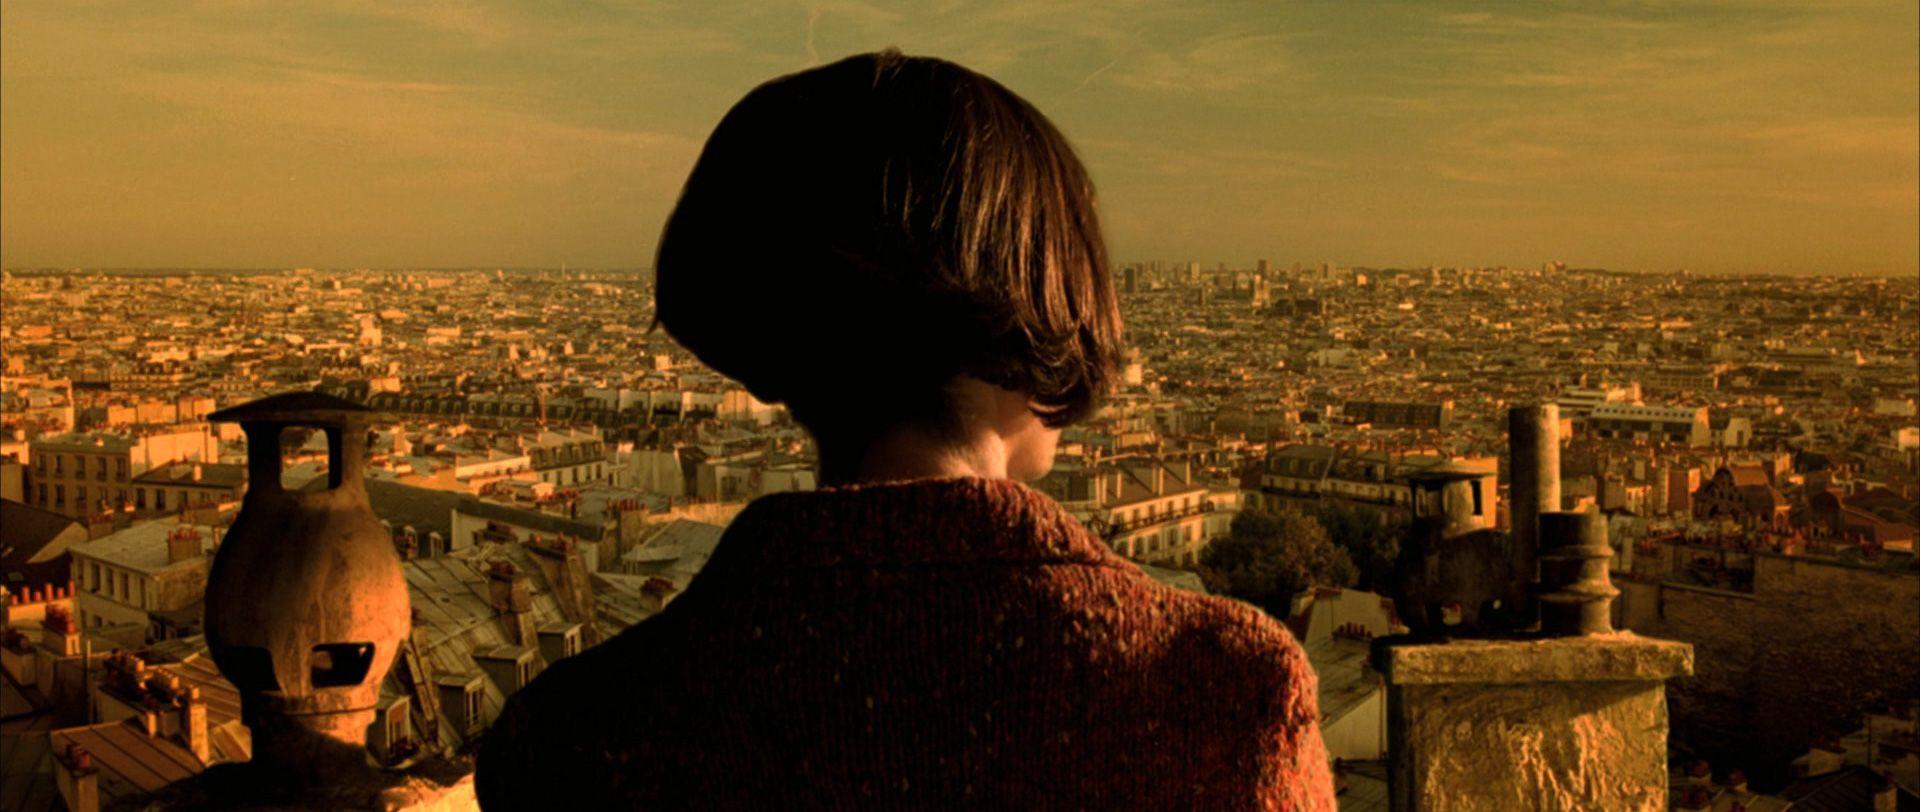 Amélie Poulain Film locations map: Montmartre Paris, Walking tour, Amélie  inspired photoshoot and more! - Chamelle Photography, Travel and Lifestyle  Blog in Mel… | Amelie, Film stills, Movie scenes